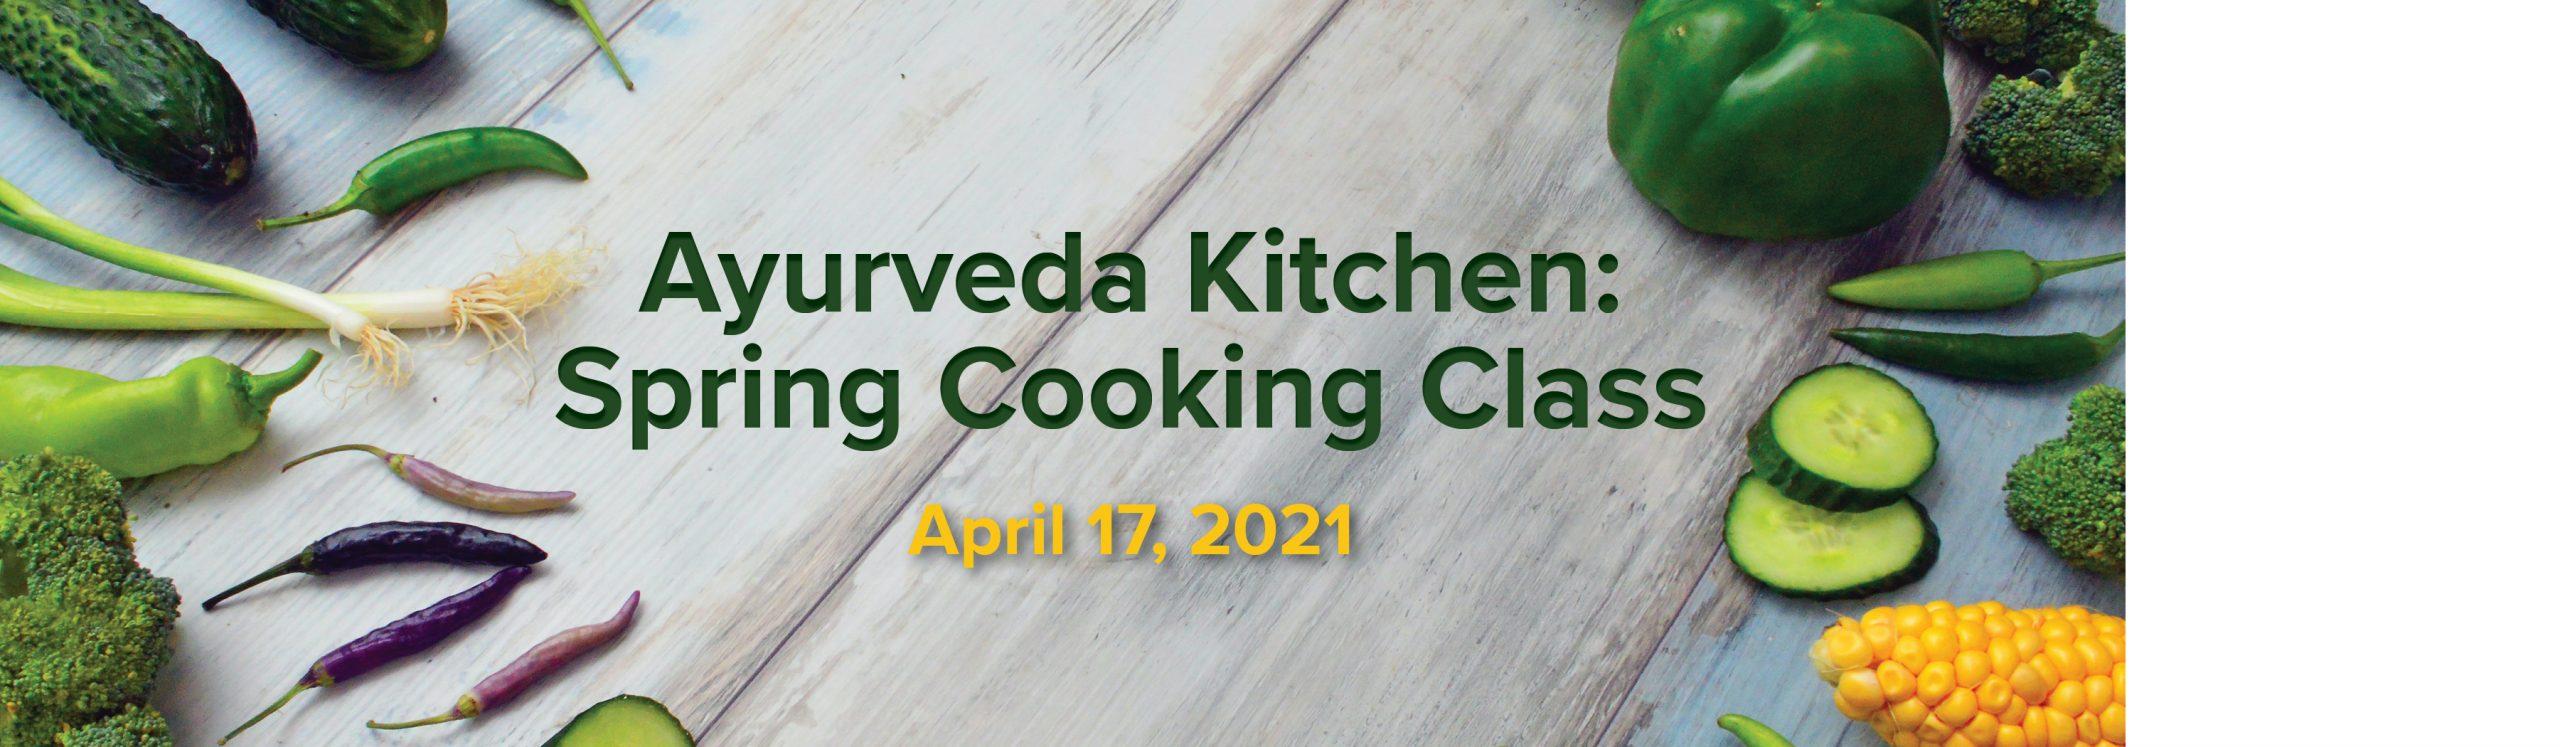 Ayurveda Kitchen: Spring Cooking Class Event Image for Sage & Fettle Ayurveda April 17, 2021